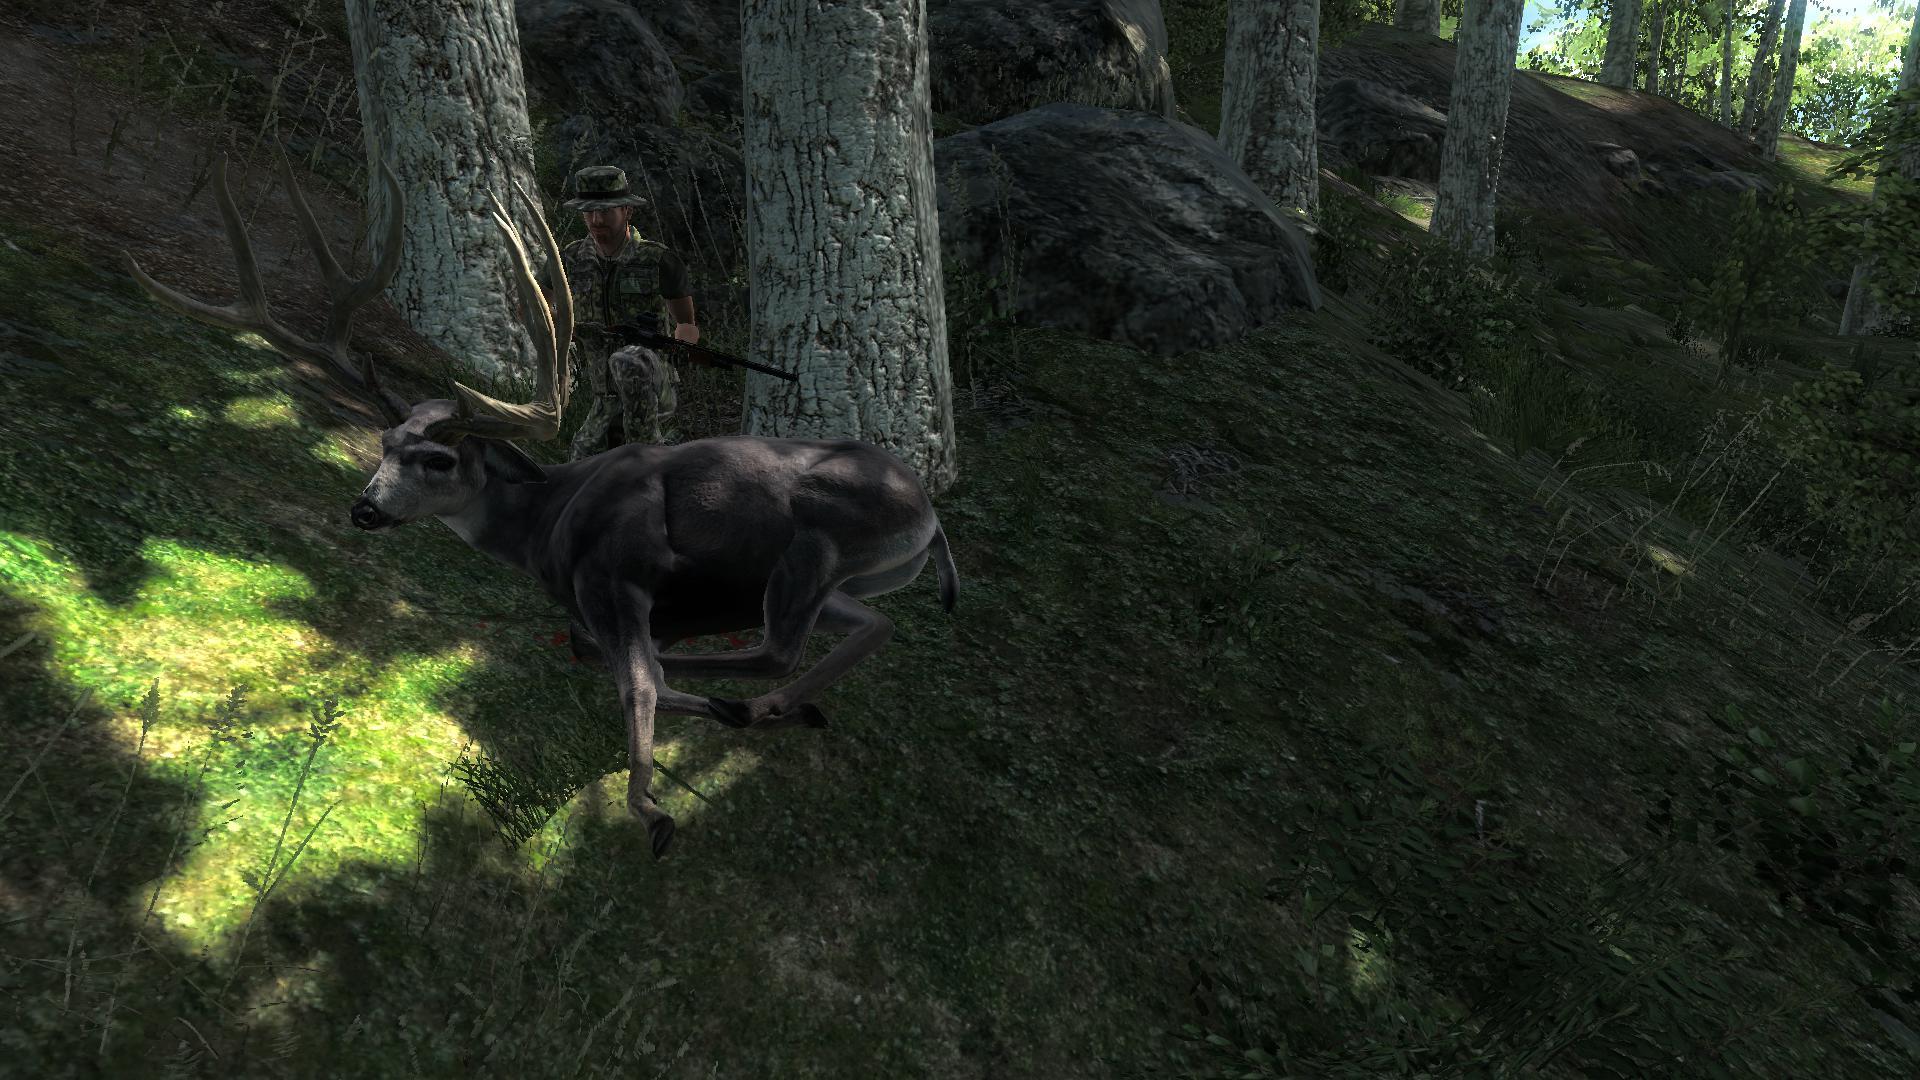 TOP 5 Mule Deer // Ciervo Mula (Typical) Cfac8bdd0649c7e1921ffddf7aa9916815fd0b2e